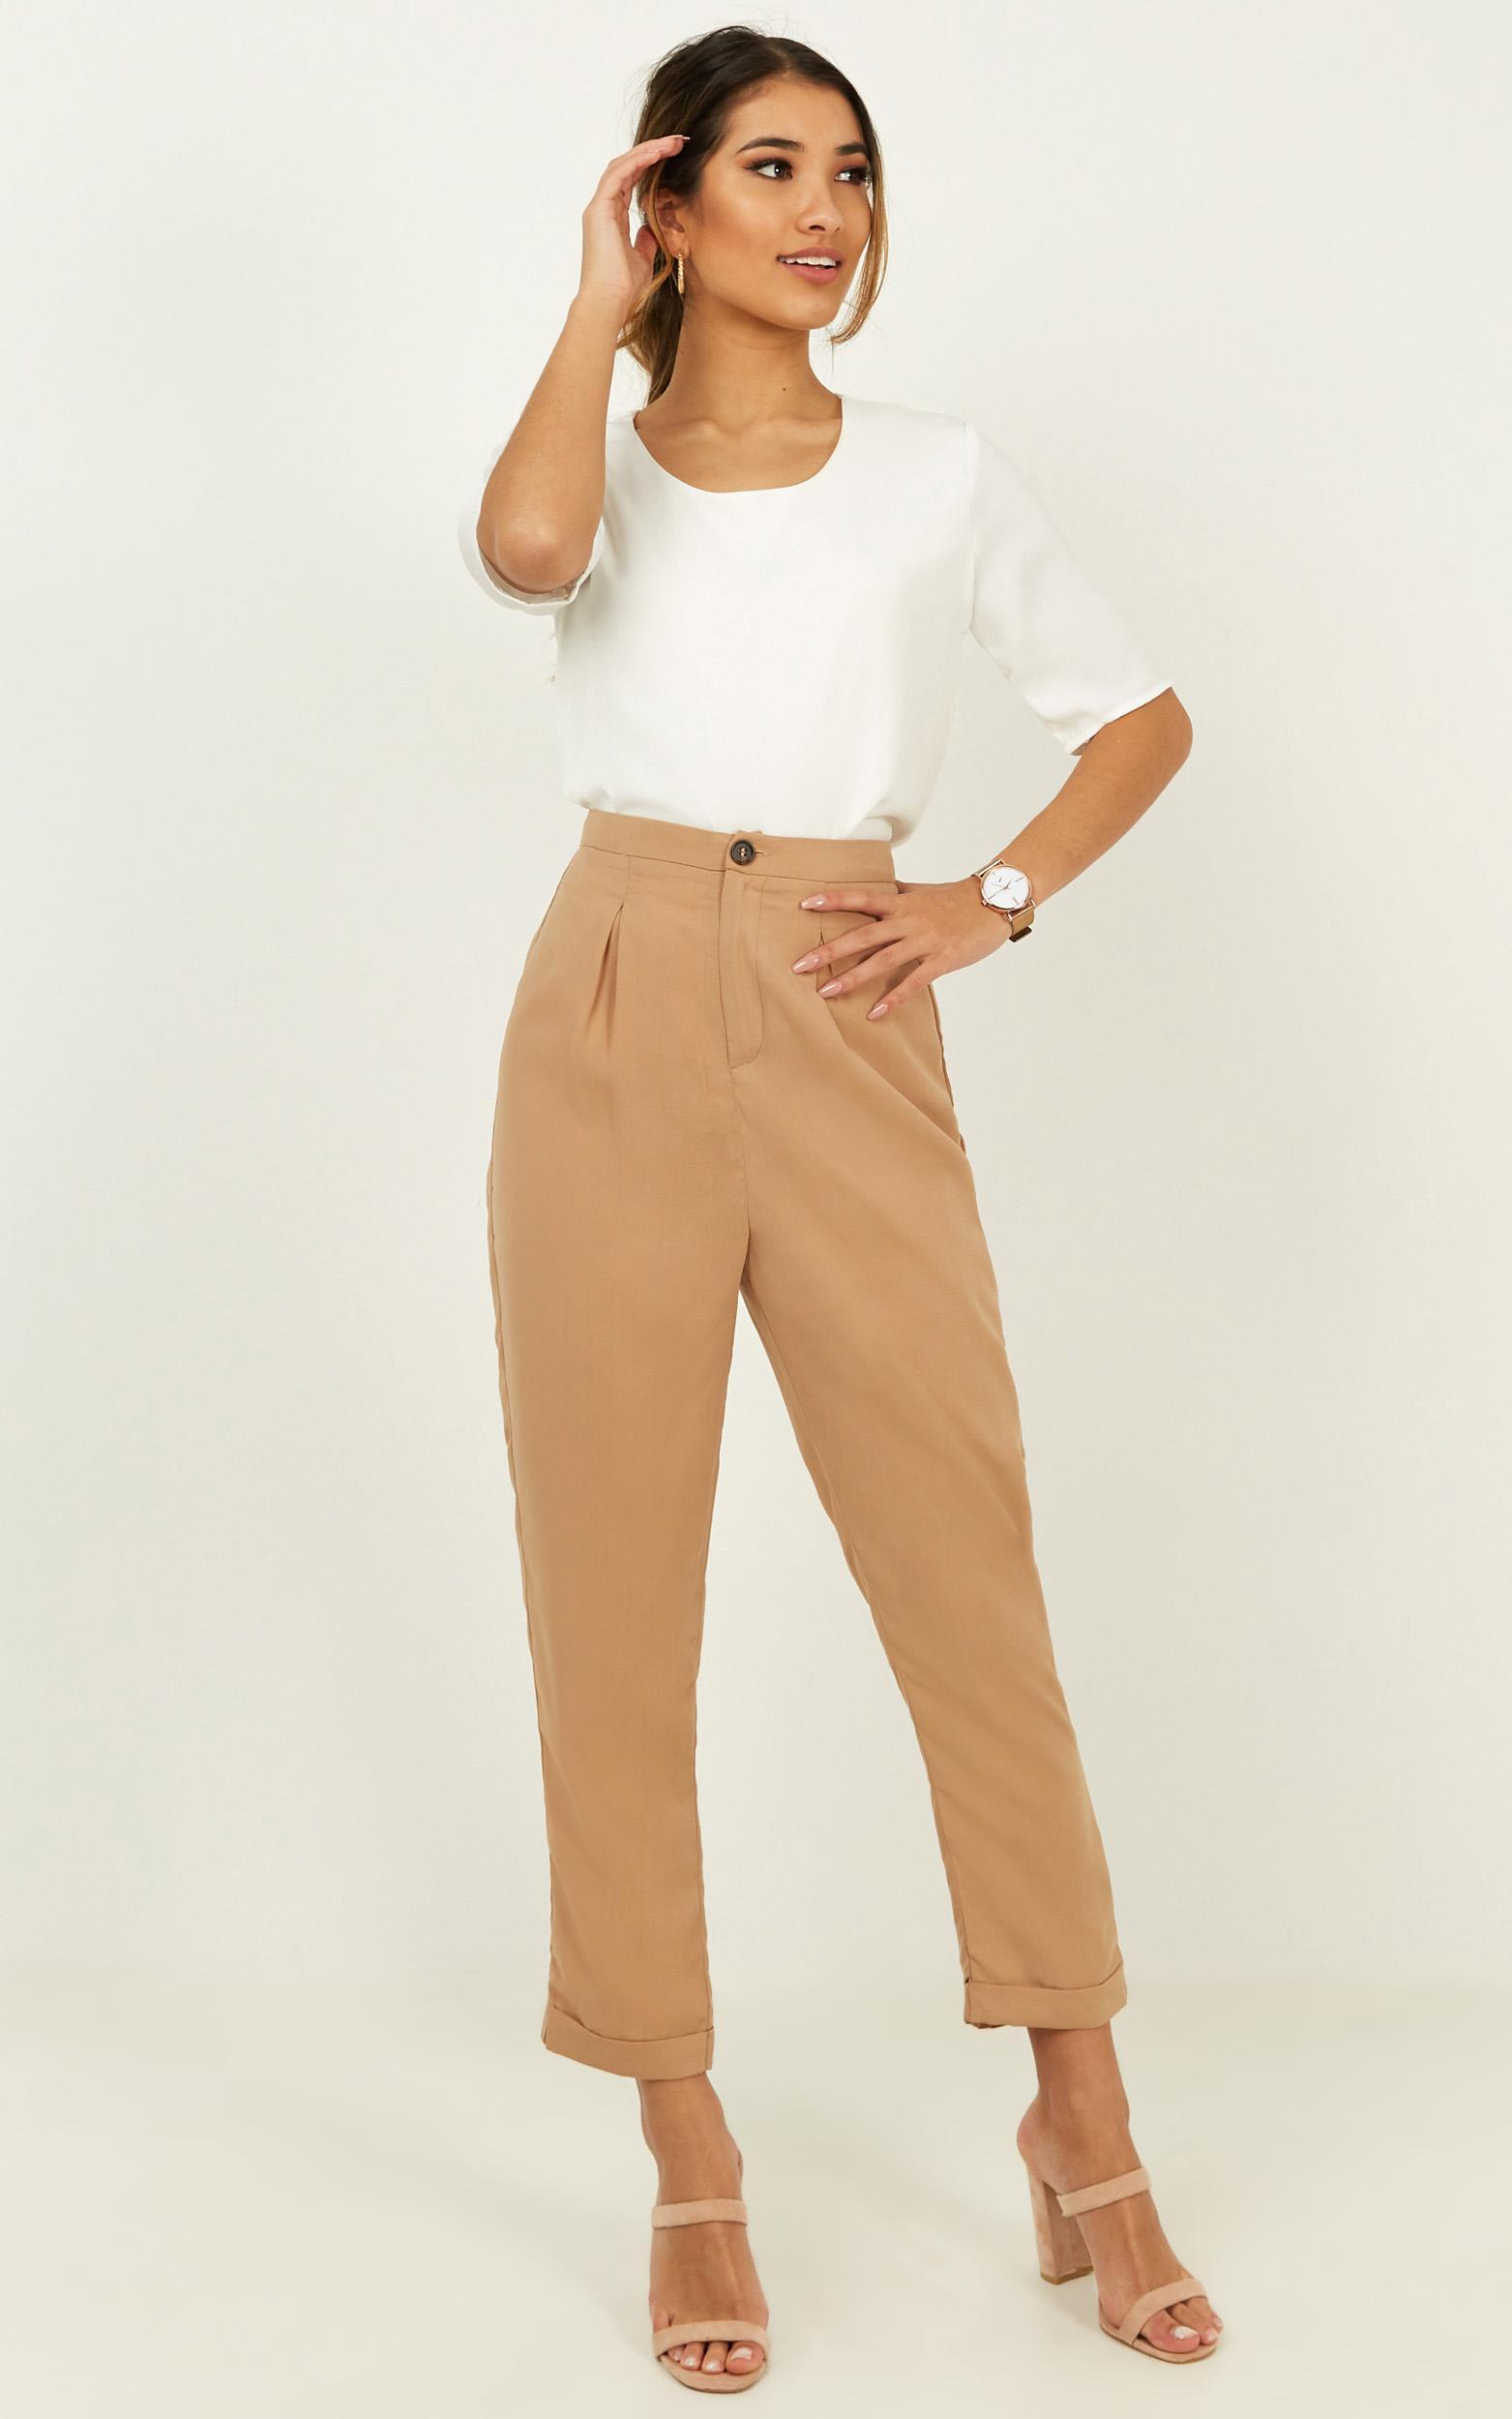 Members Only Pants in beige - 20 (XXXXL), Beige, hi-res image number null